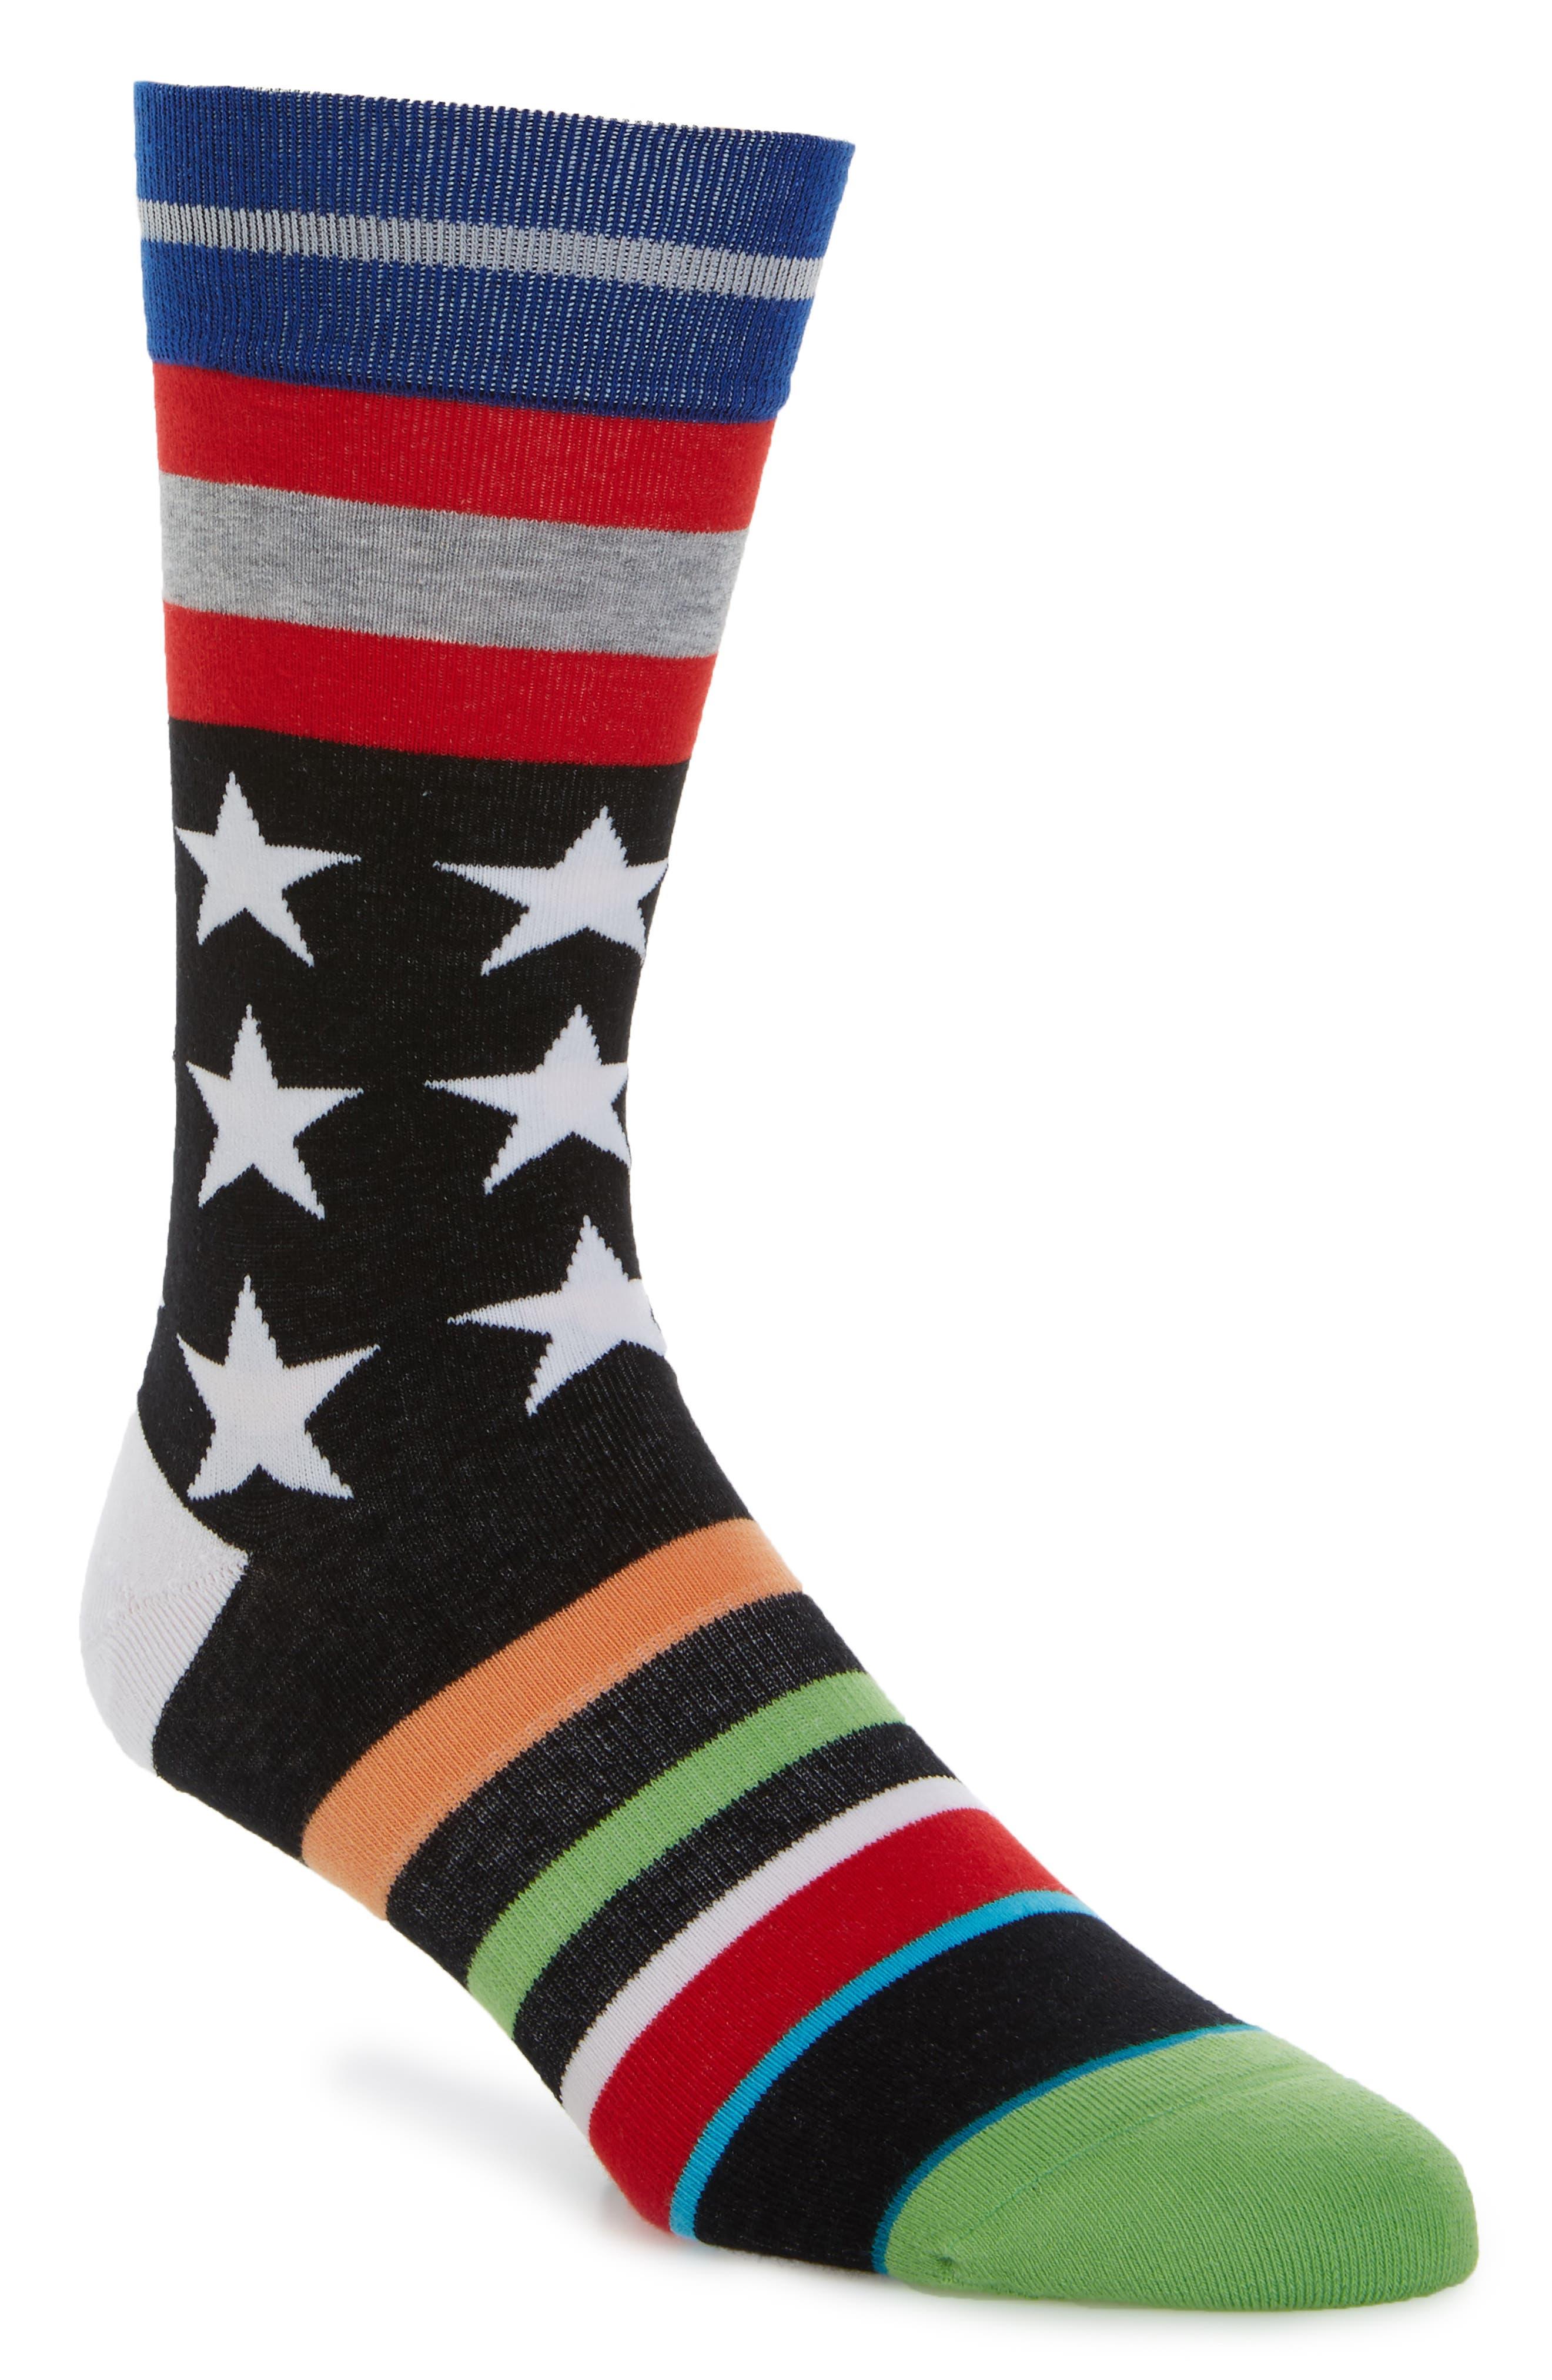 Harden Salute Socks,                             Main thumbnail 1, color,                             001